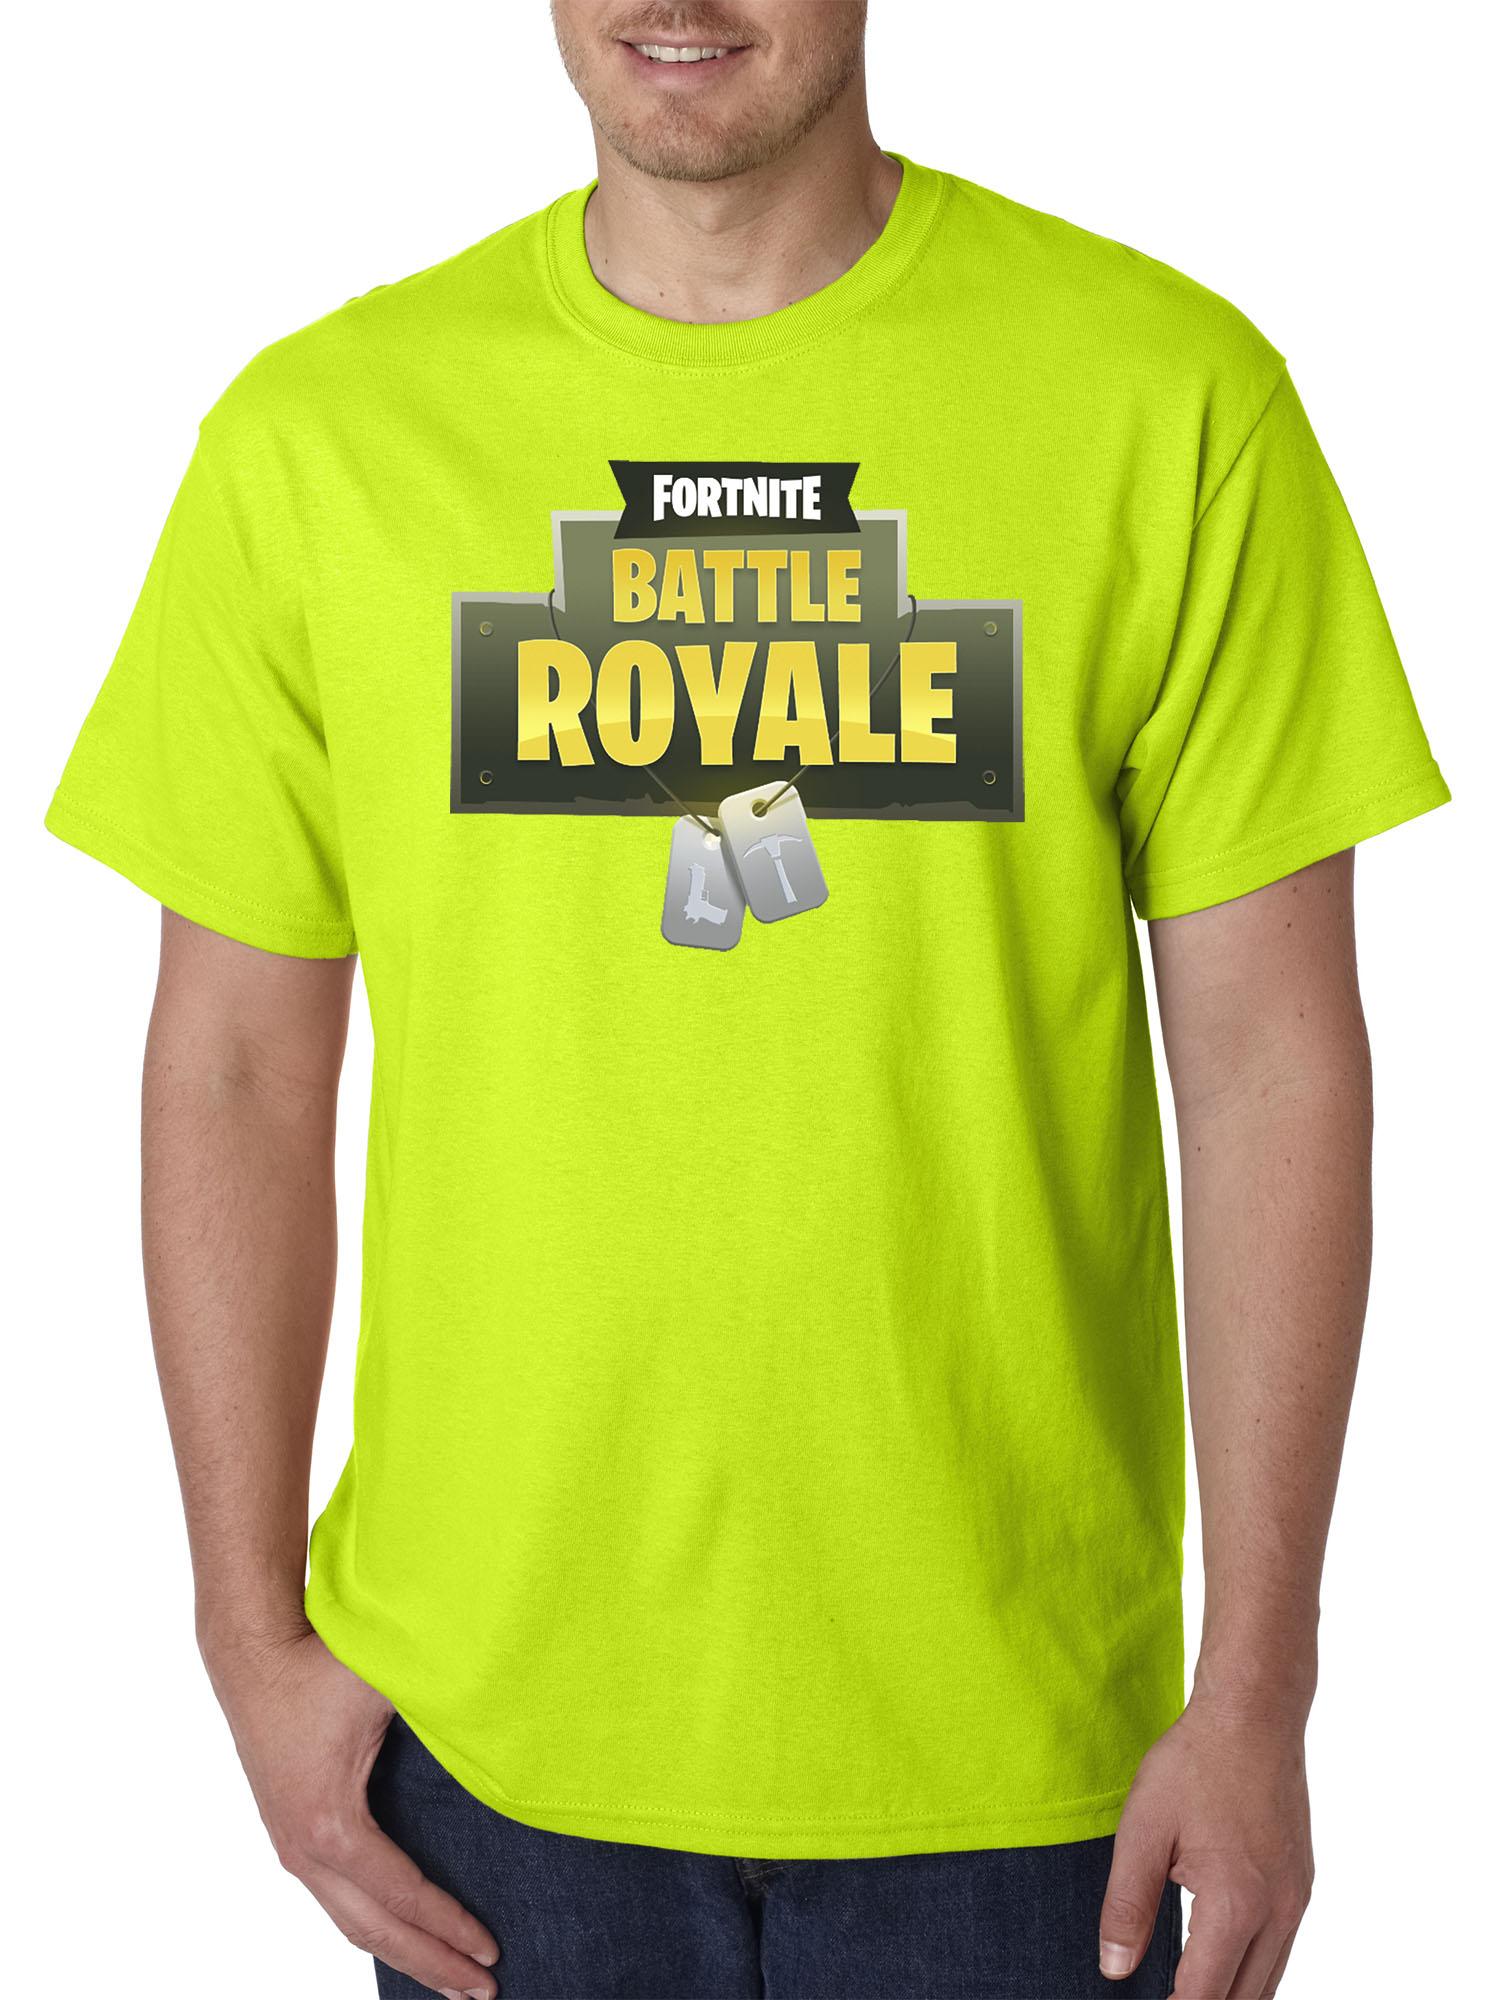 Got Popcorn Kids Tee Shirt Pick Size /& Color 2T XL